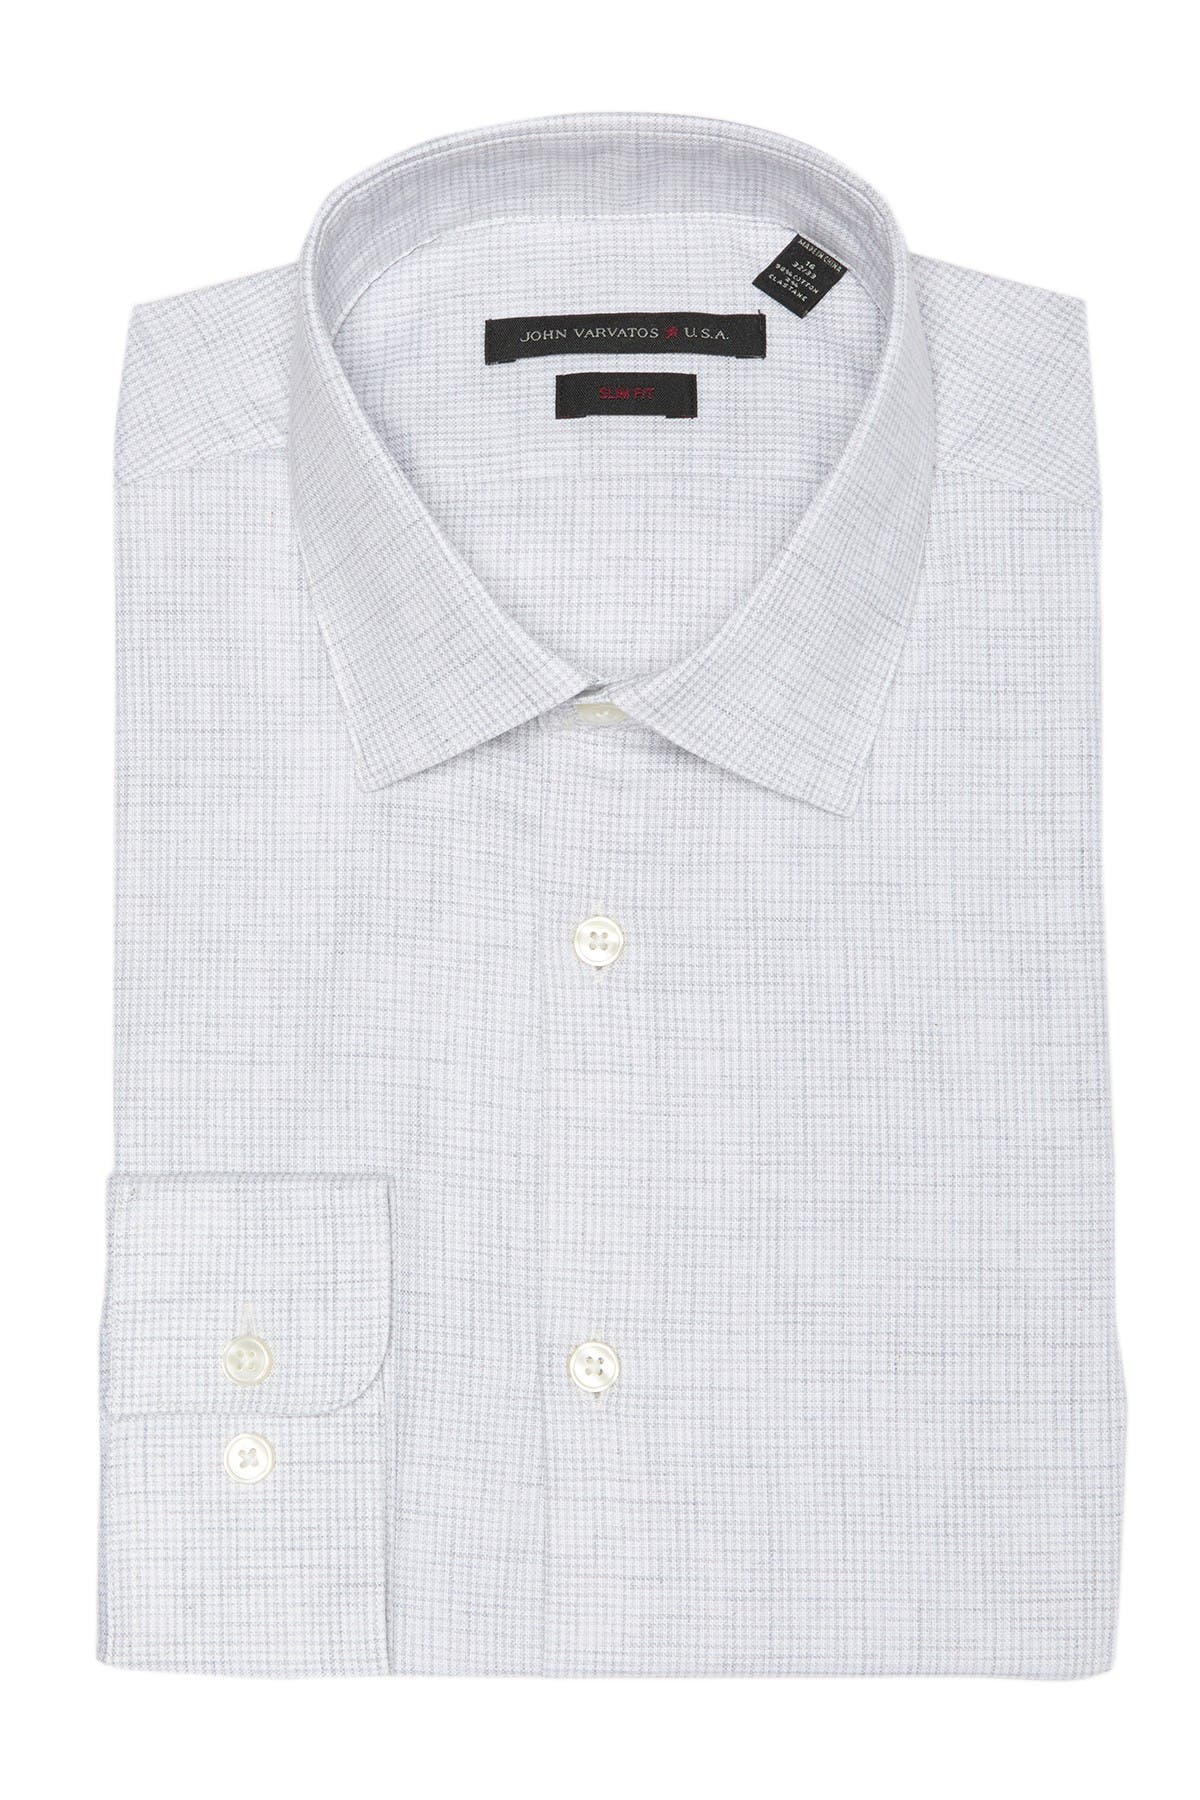 Image of John Varvatos Star USA Heathered Slim Fit Dress Shirt